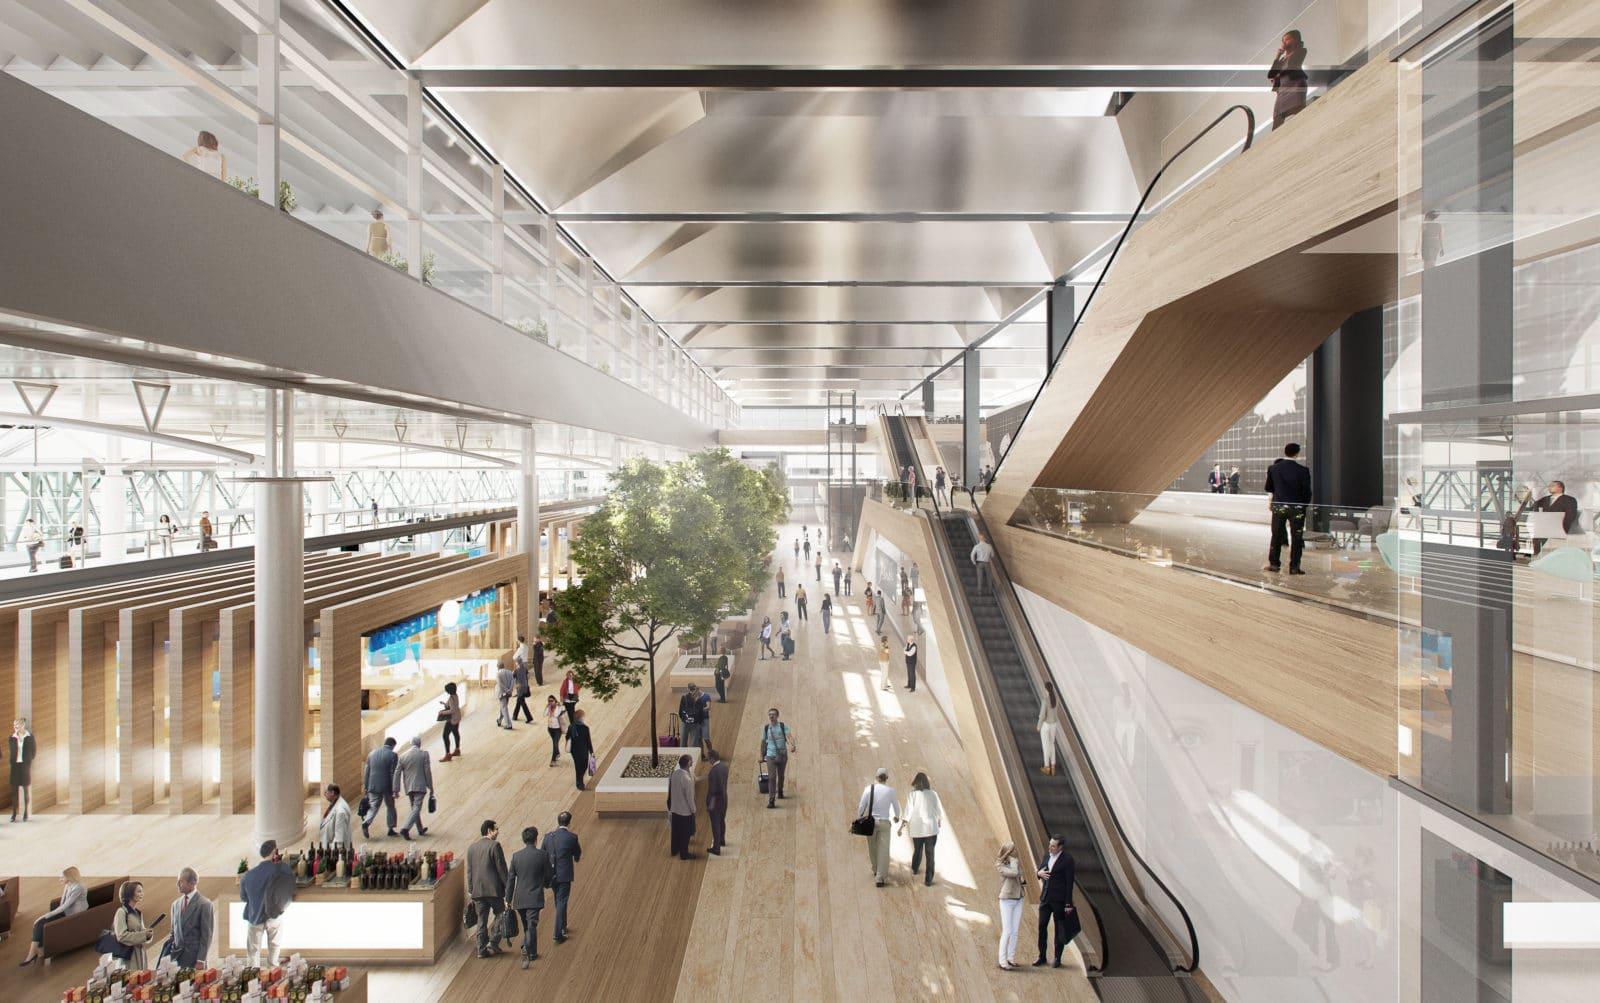 aeroport marseille extension foster 8